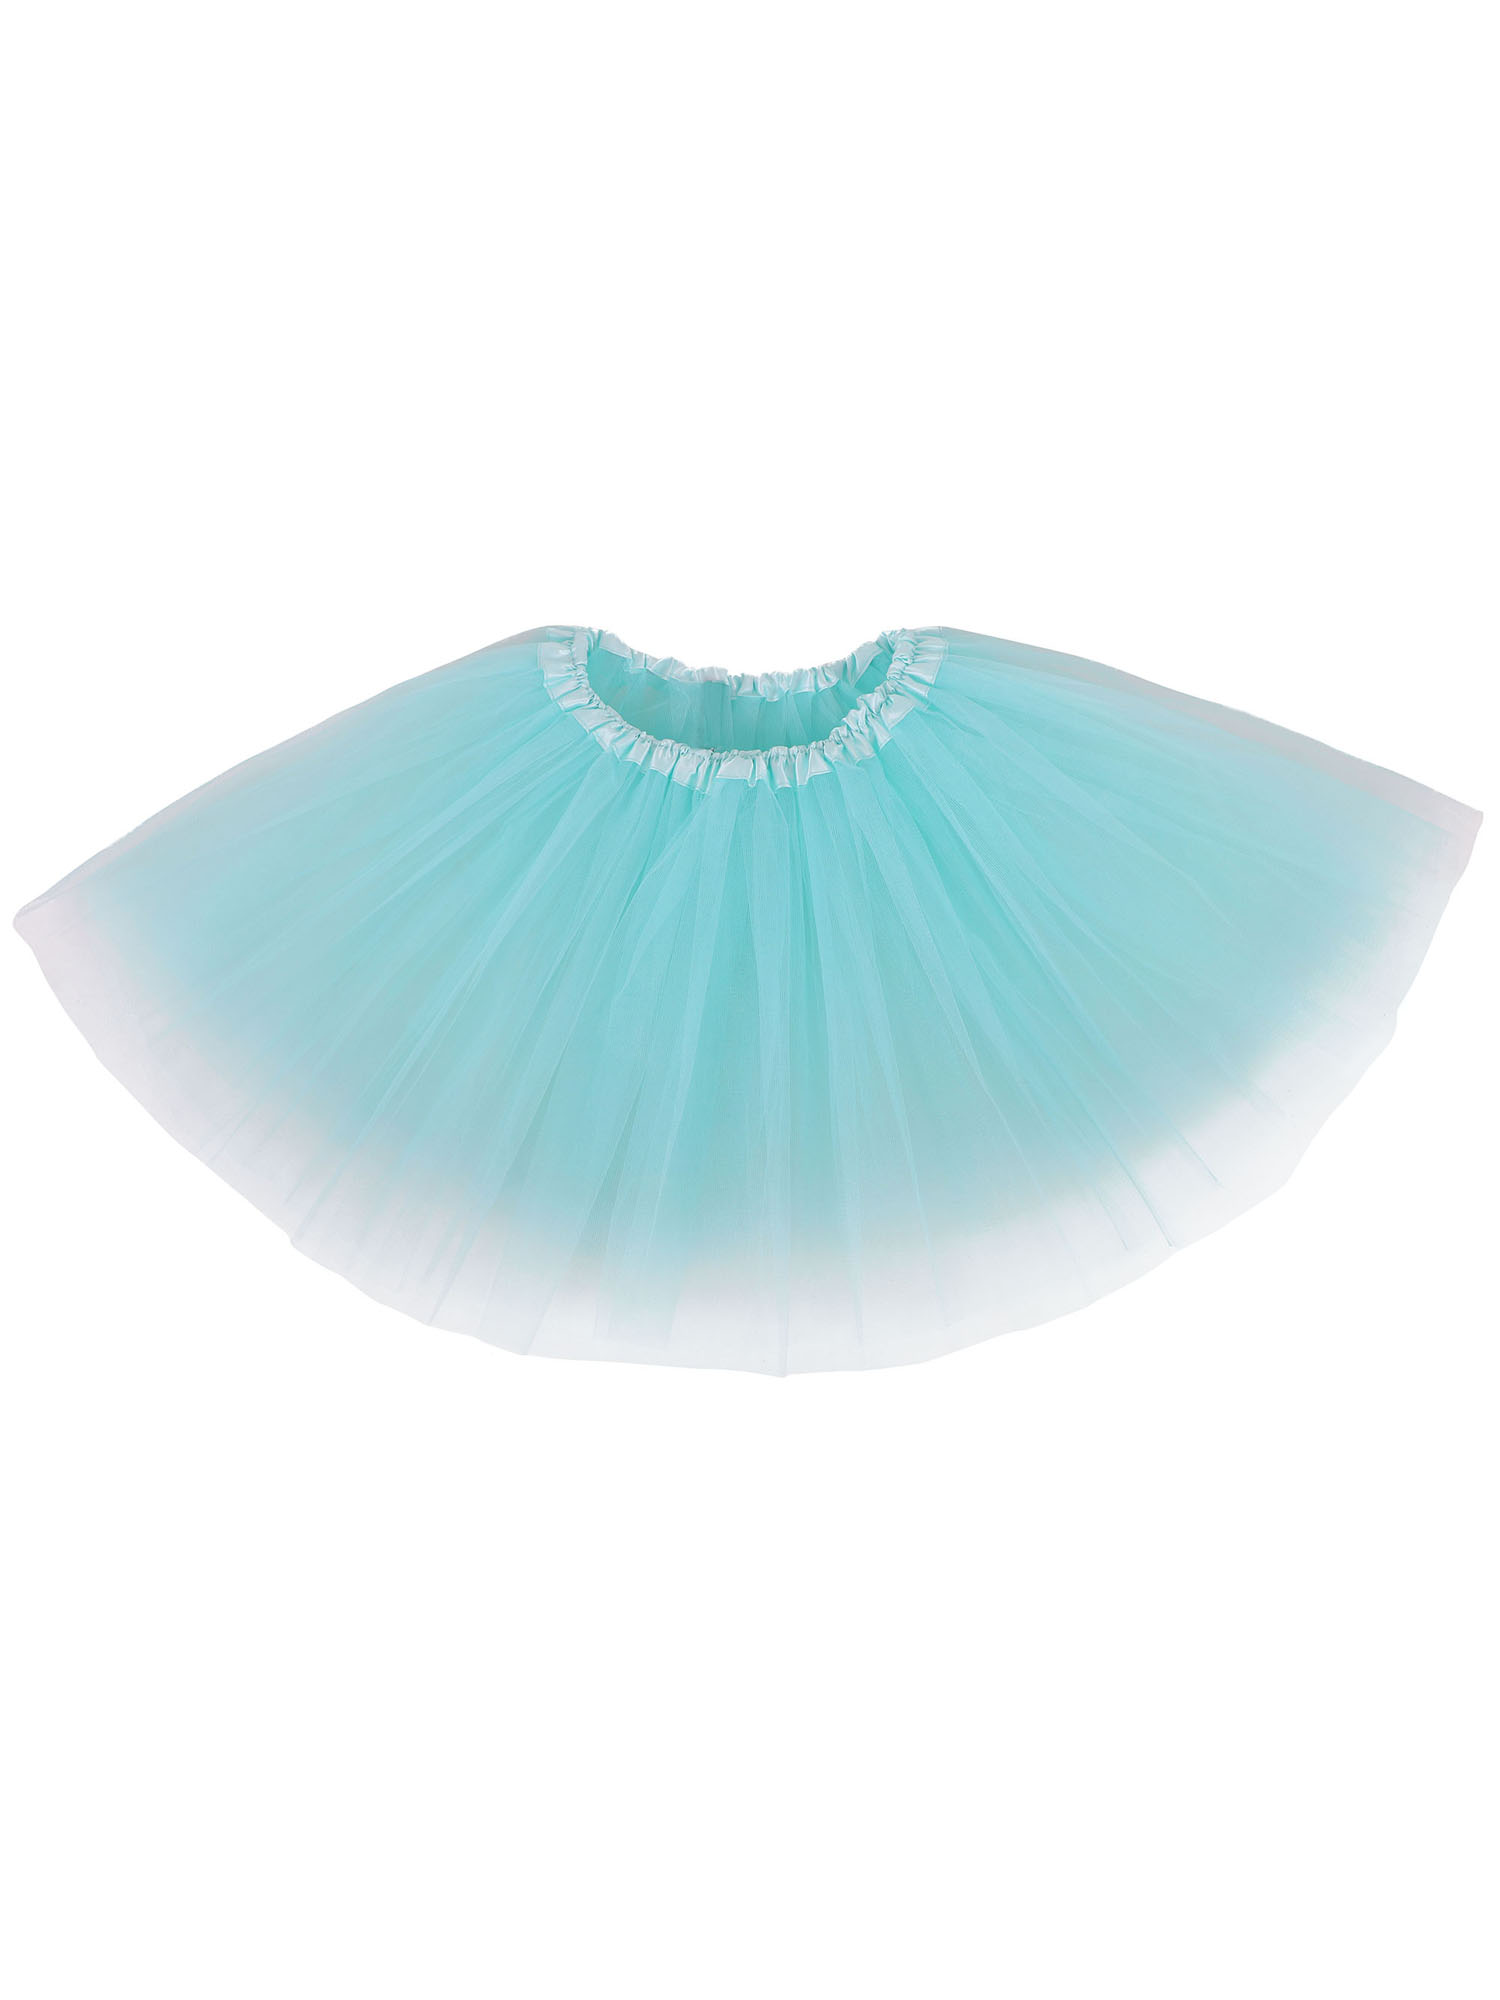 845158eb8b Women's Classical Vintage Triple Layered Tulle Tutu Skirt, Teal Green ...